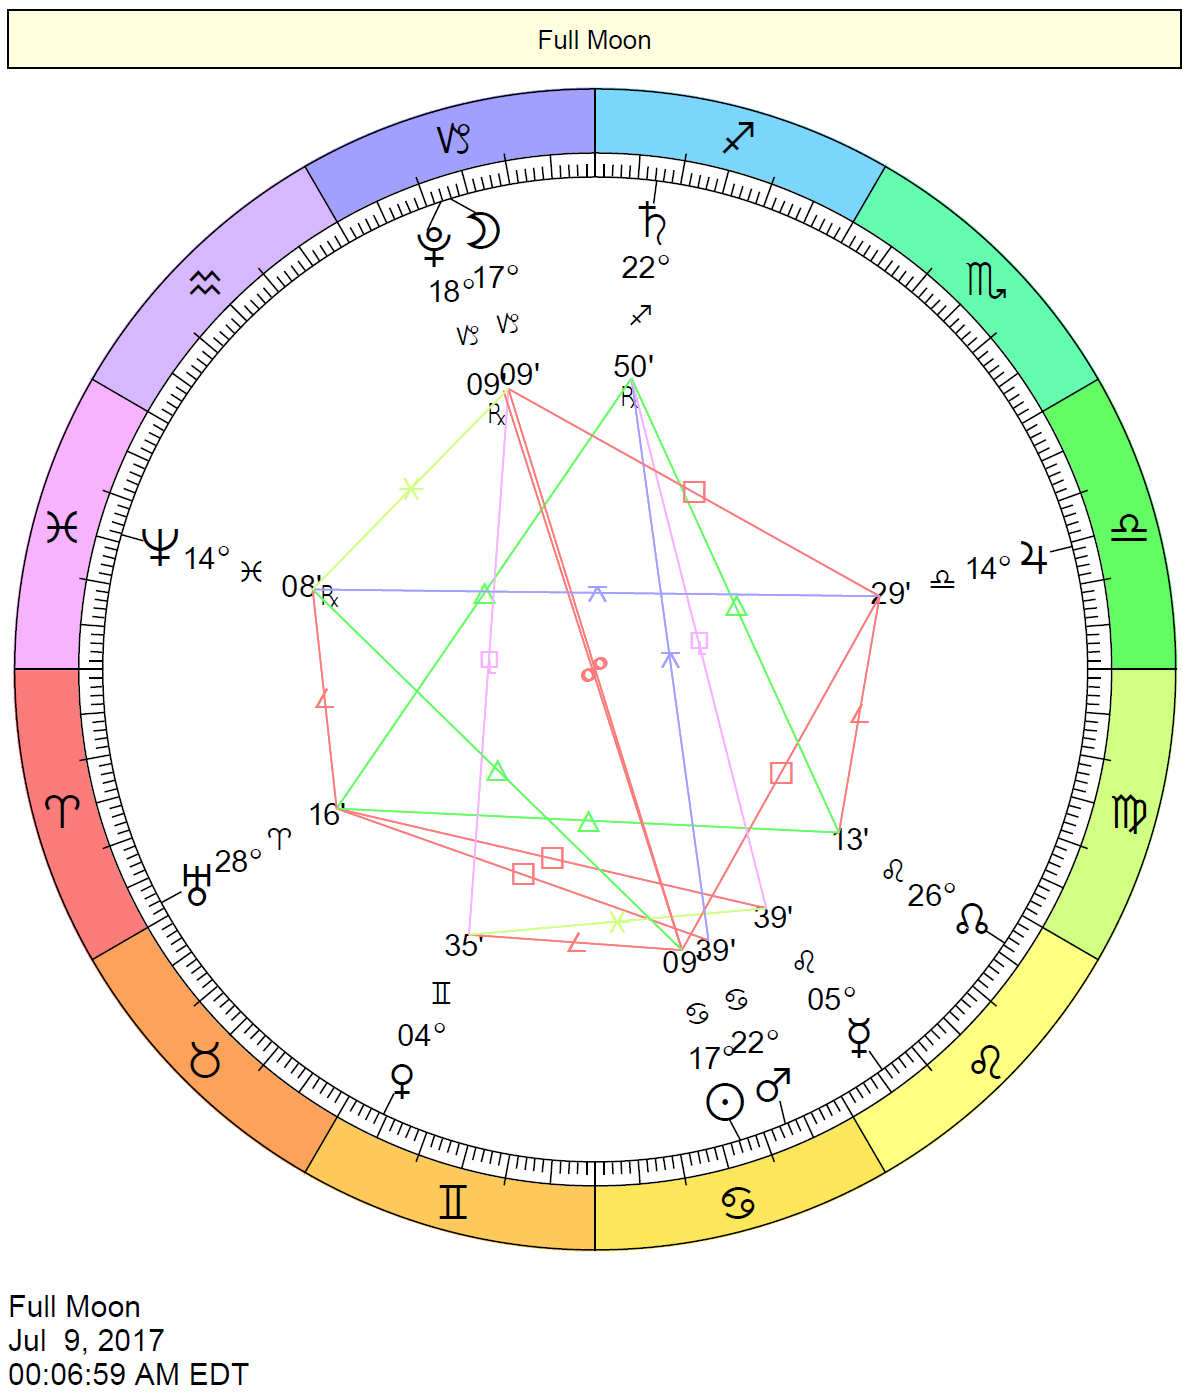 Full Moon In Capricorn Chart - July 9, 2017